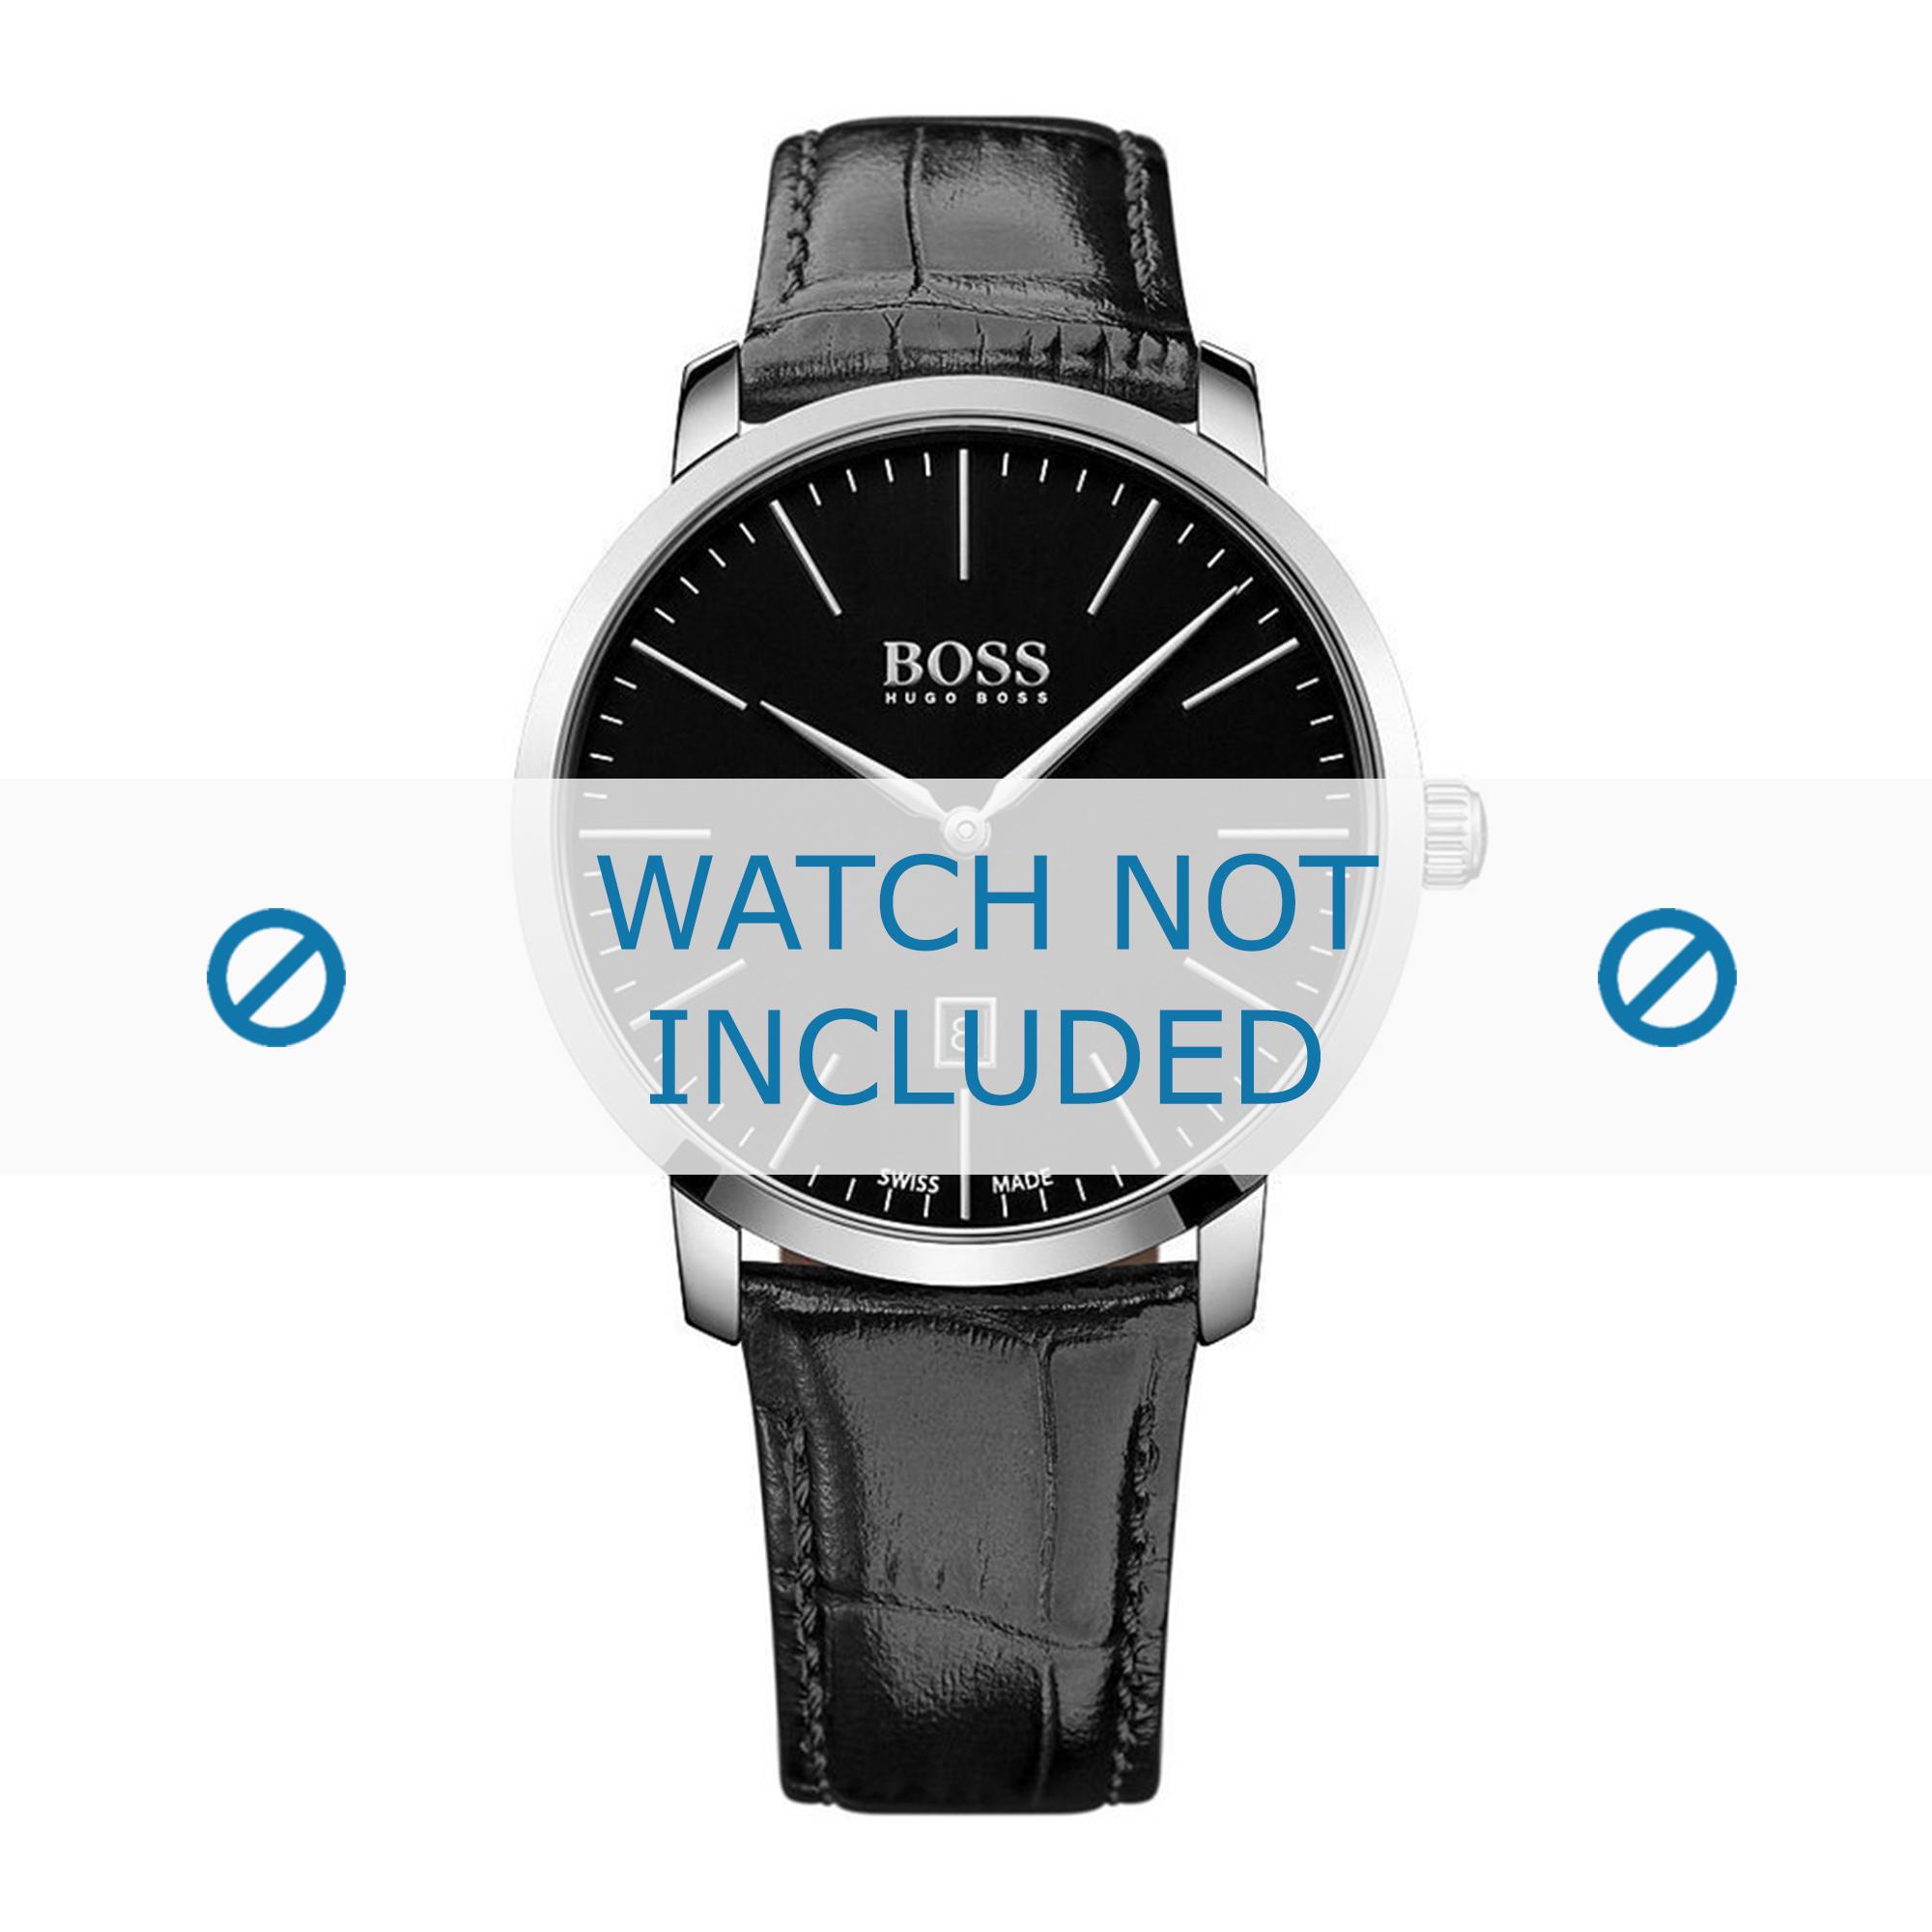 Hugo Boss horlogeband HB-273-1-14-2823-HB1513258 Croco leder Zwart + zwart stiksel